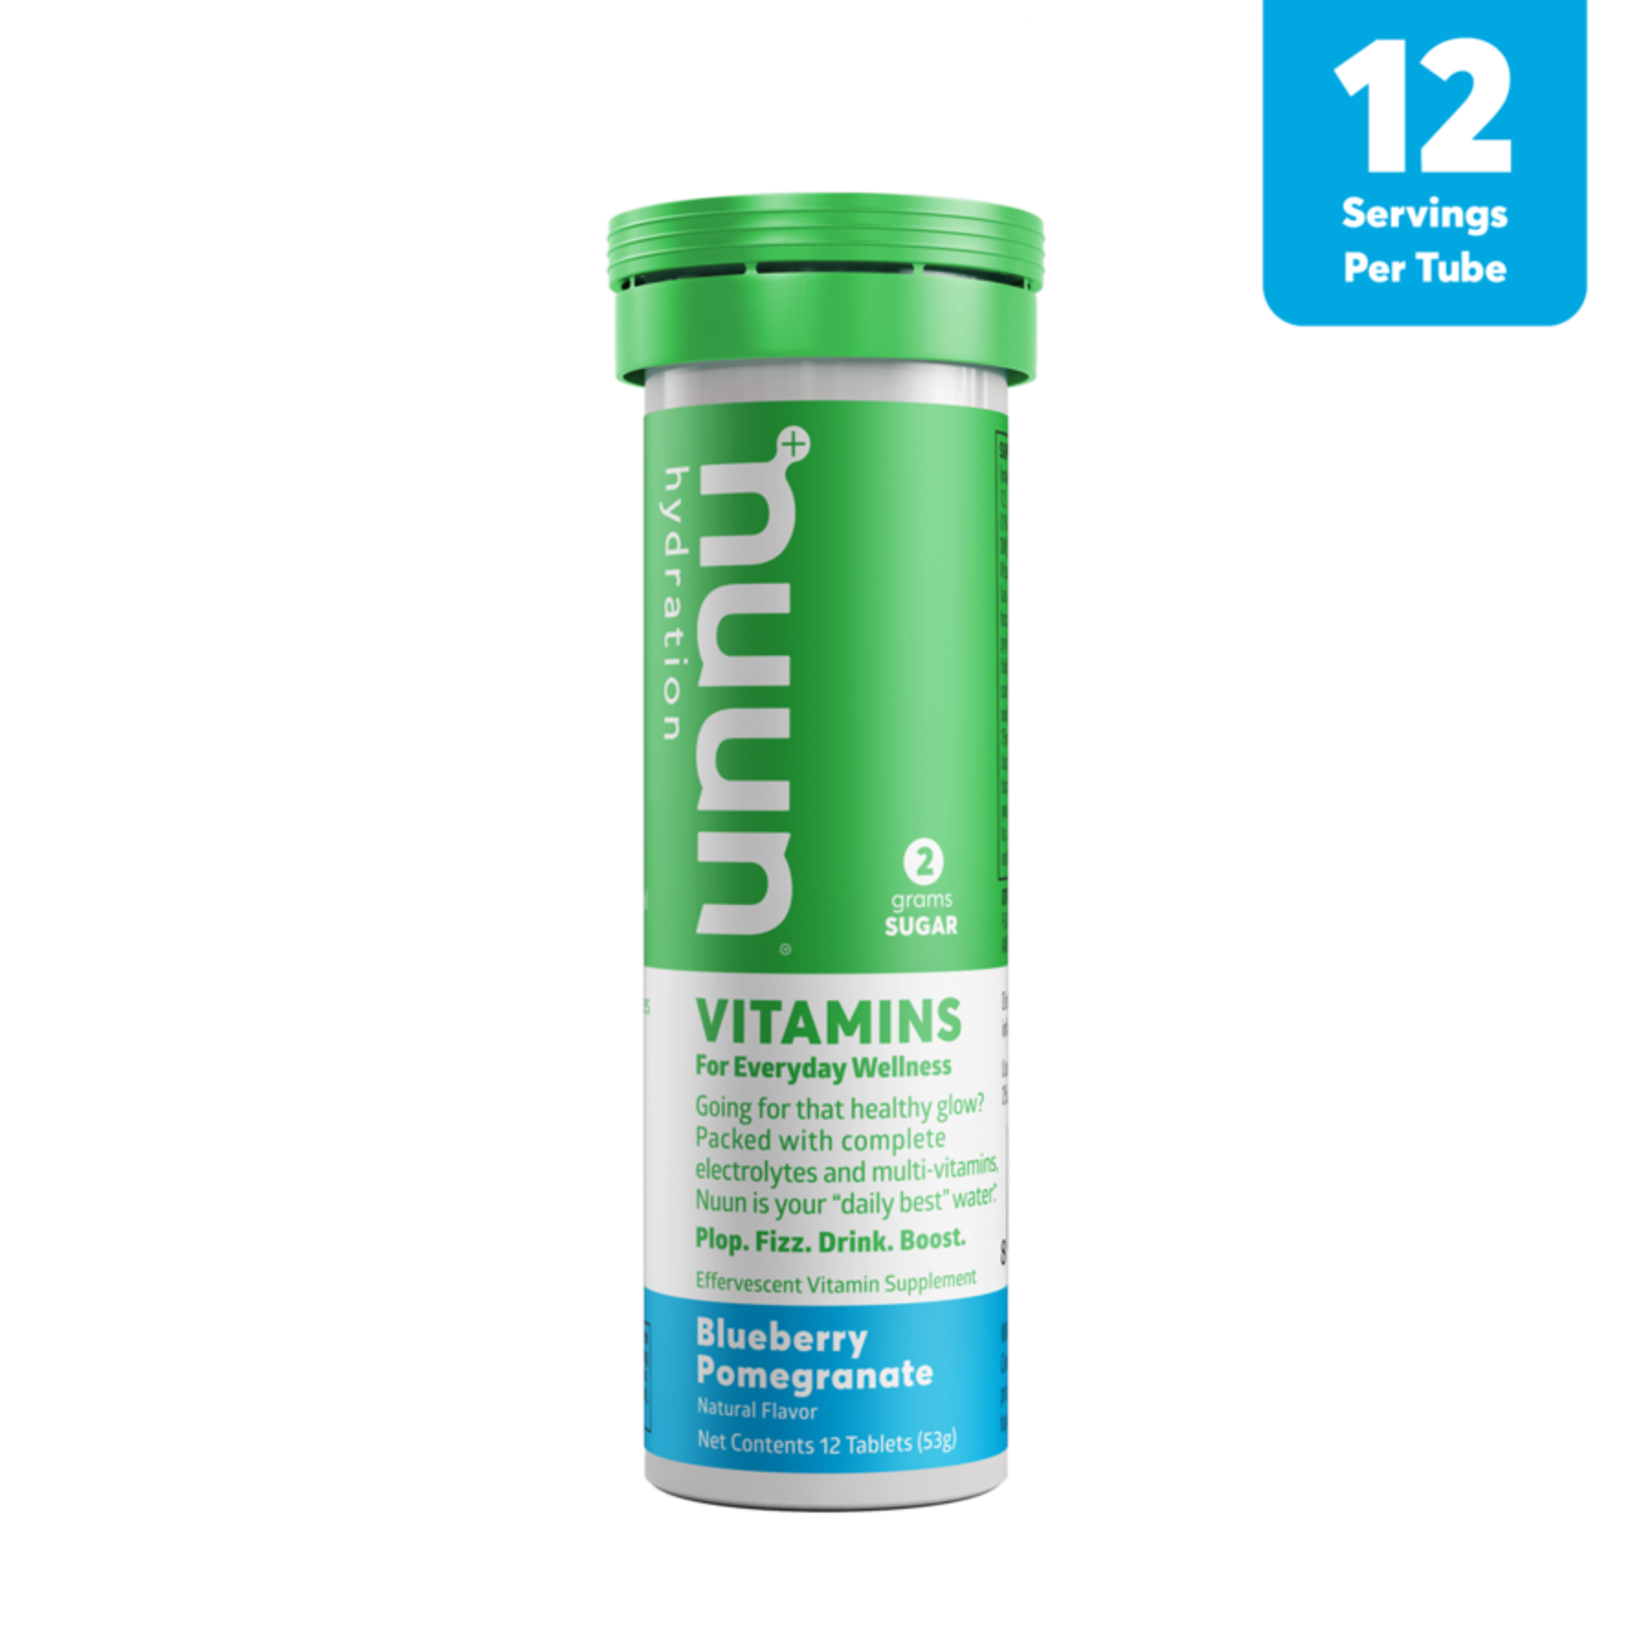 Nuun Vitamin - Bleuet et grenade